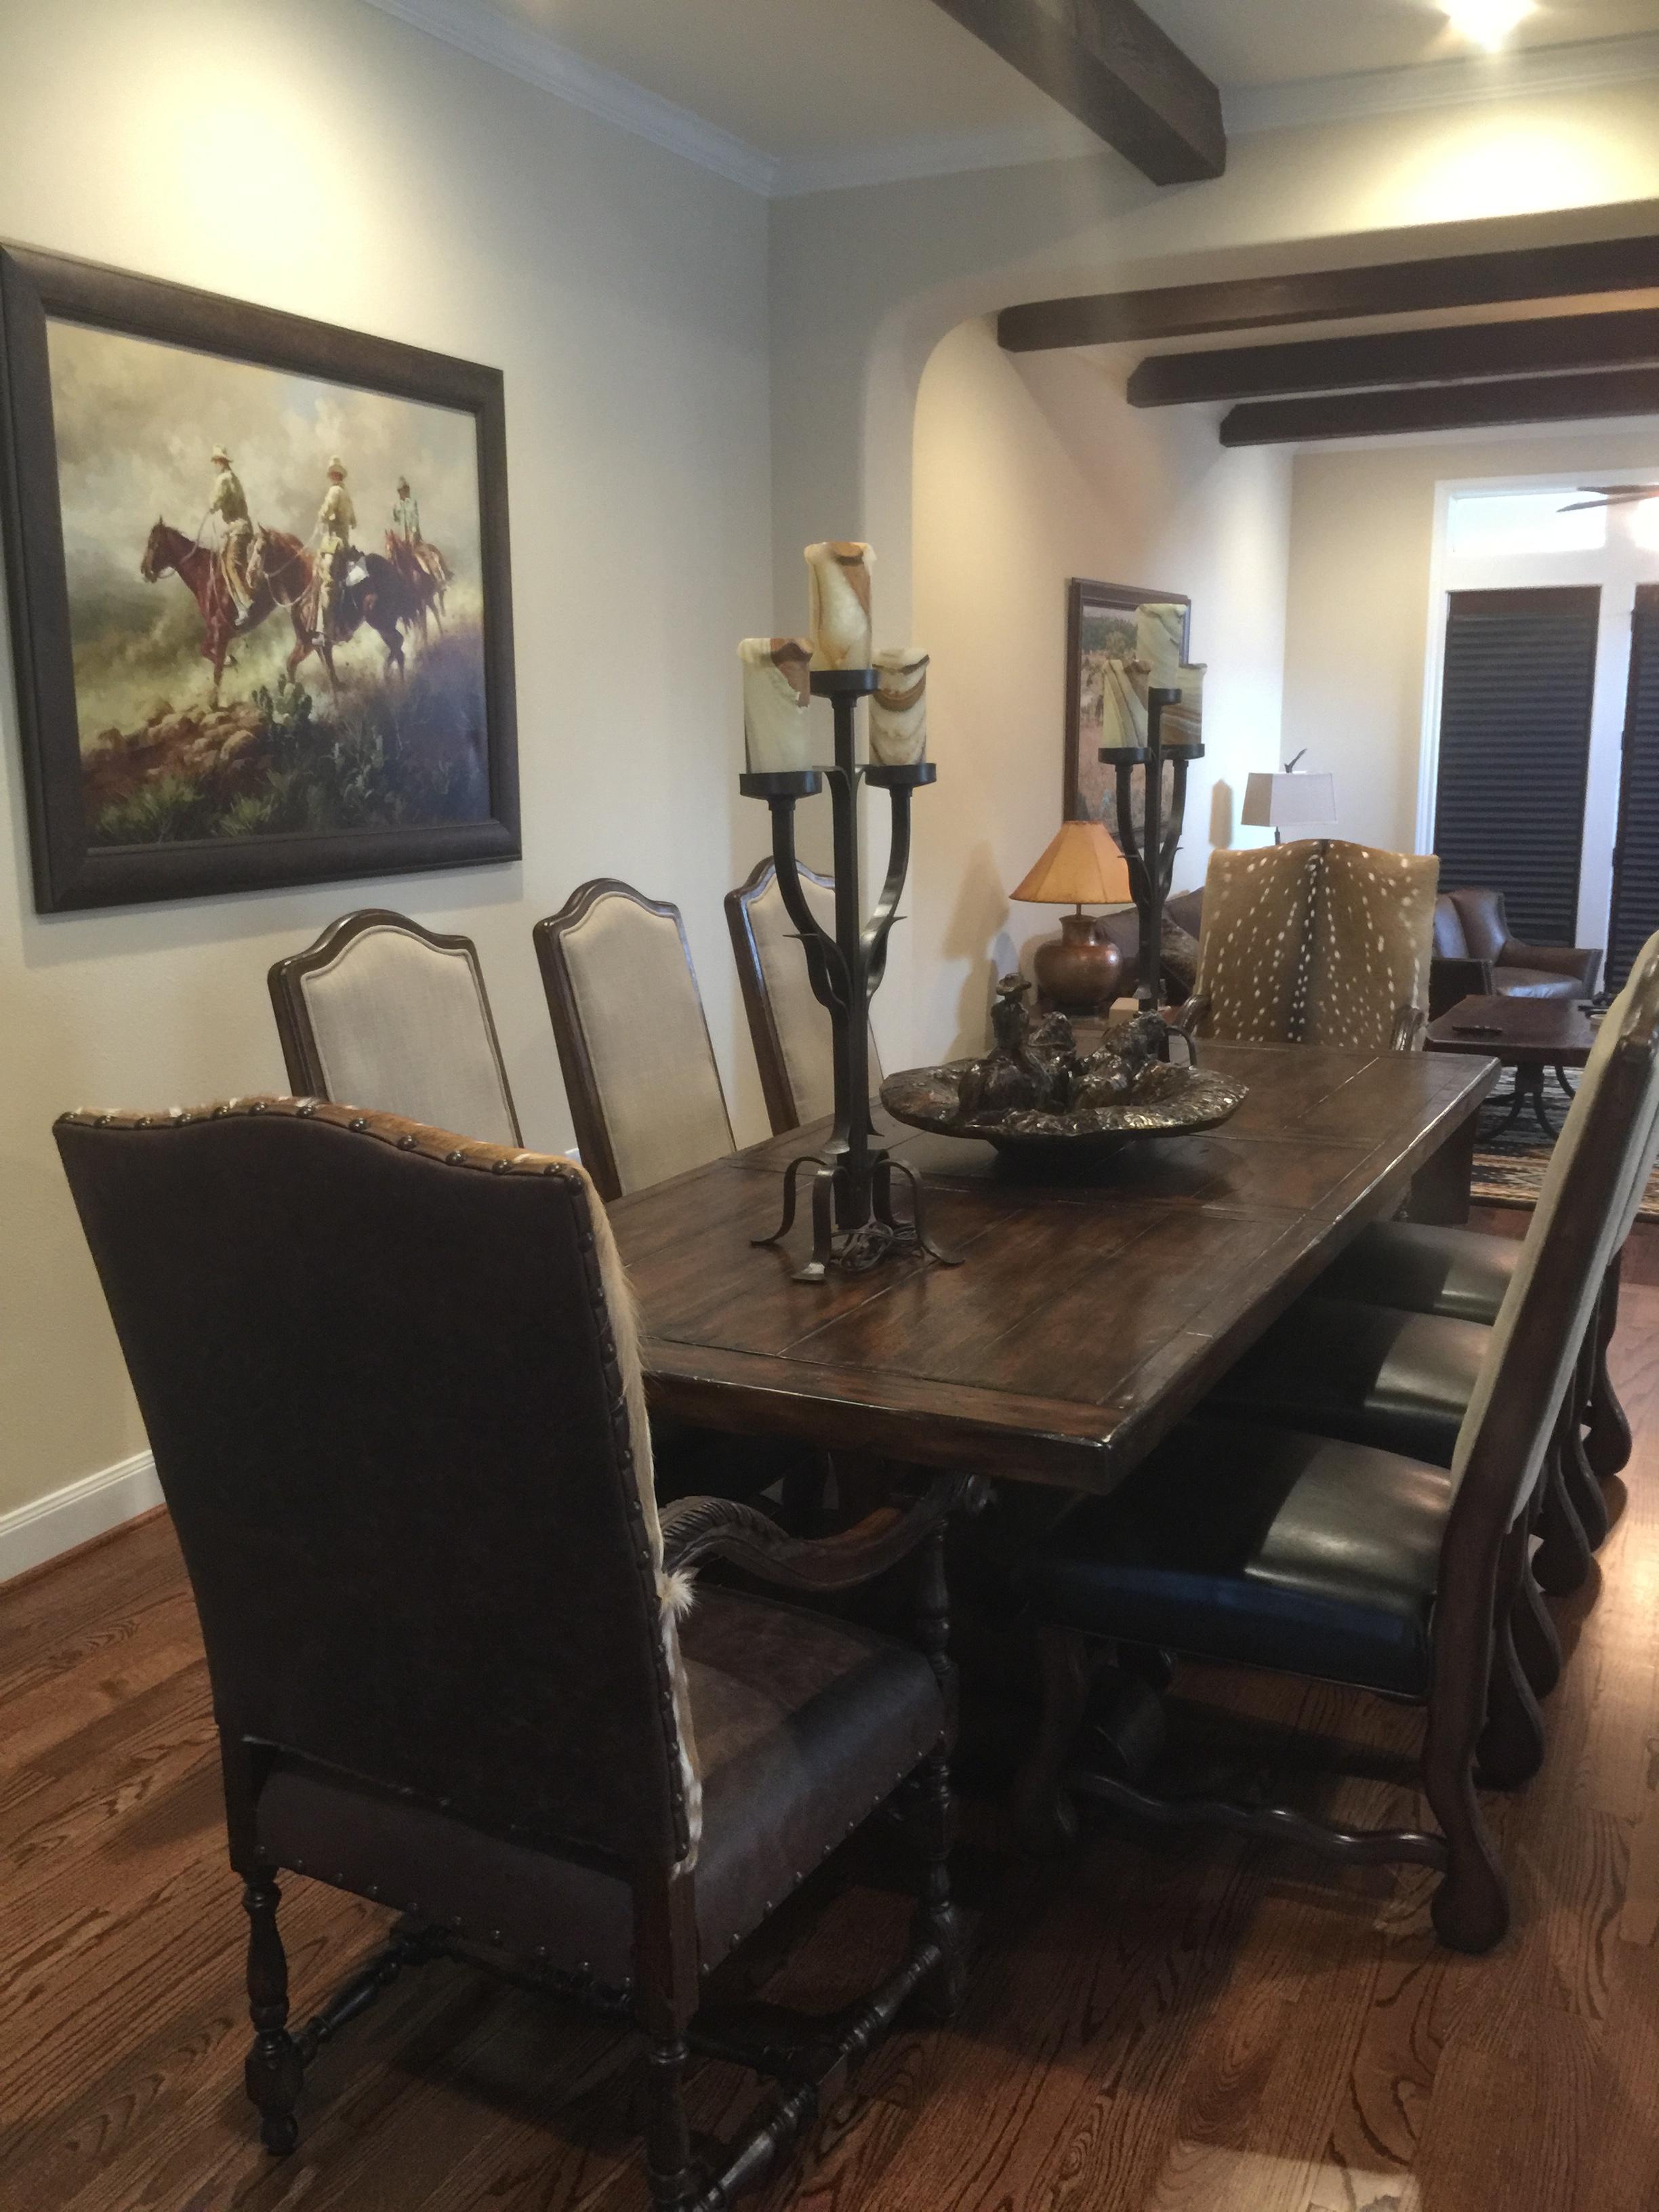 Fullsize Of Rustic Elegance Home Decor